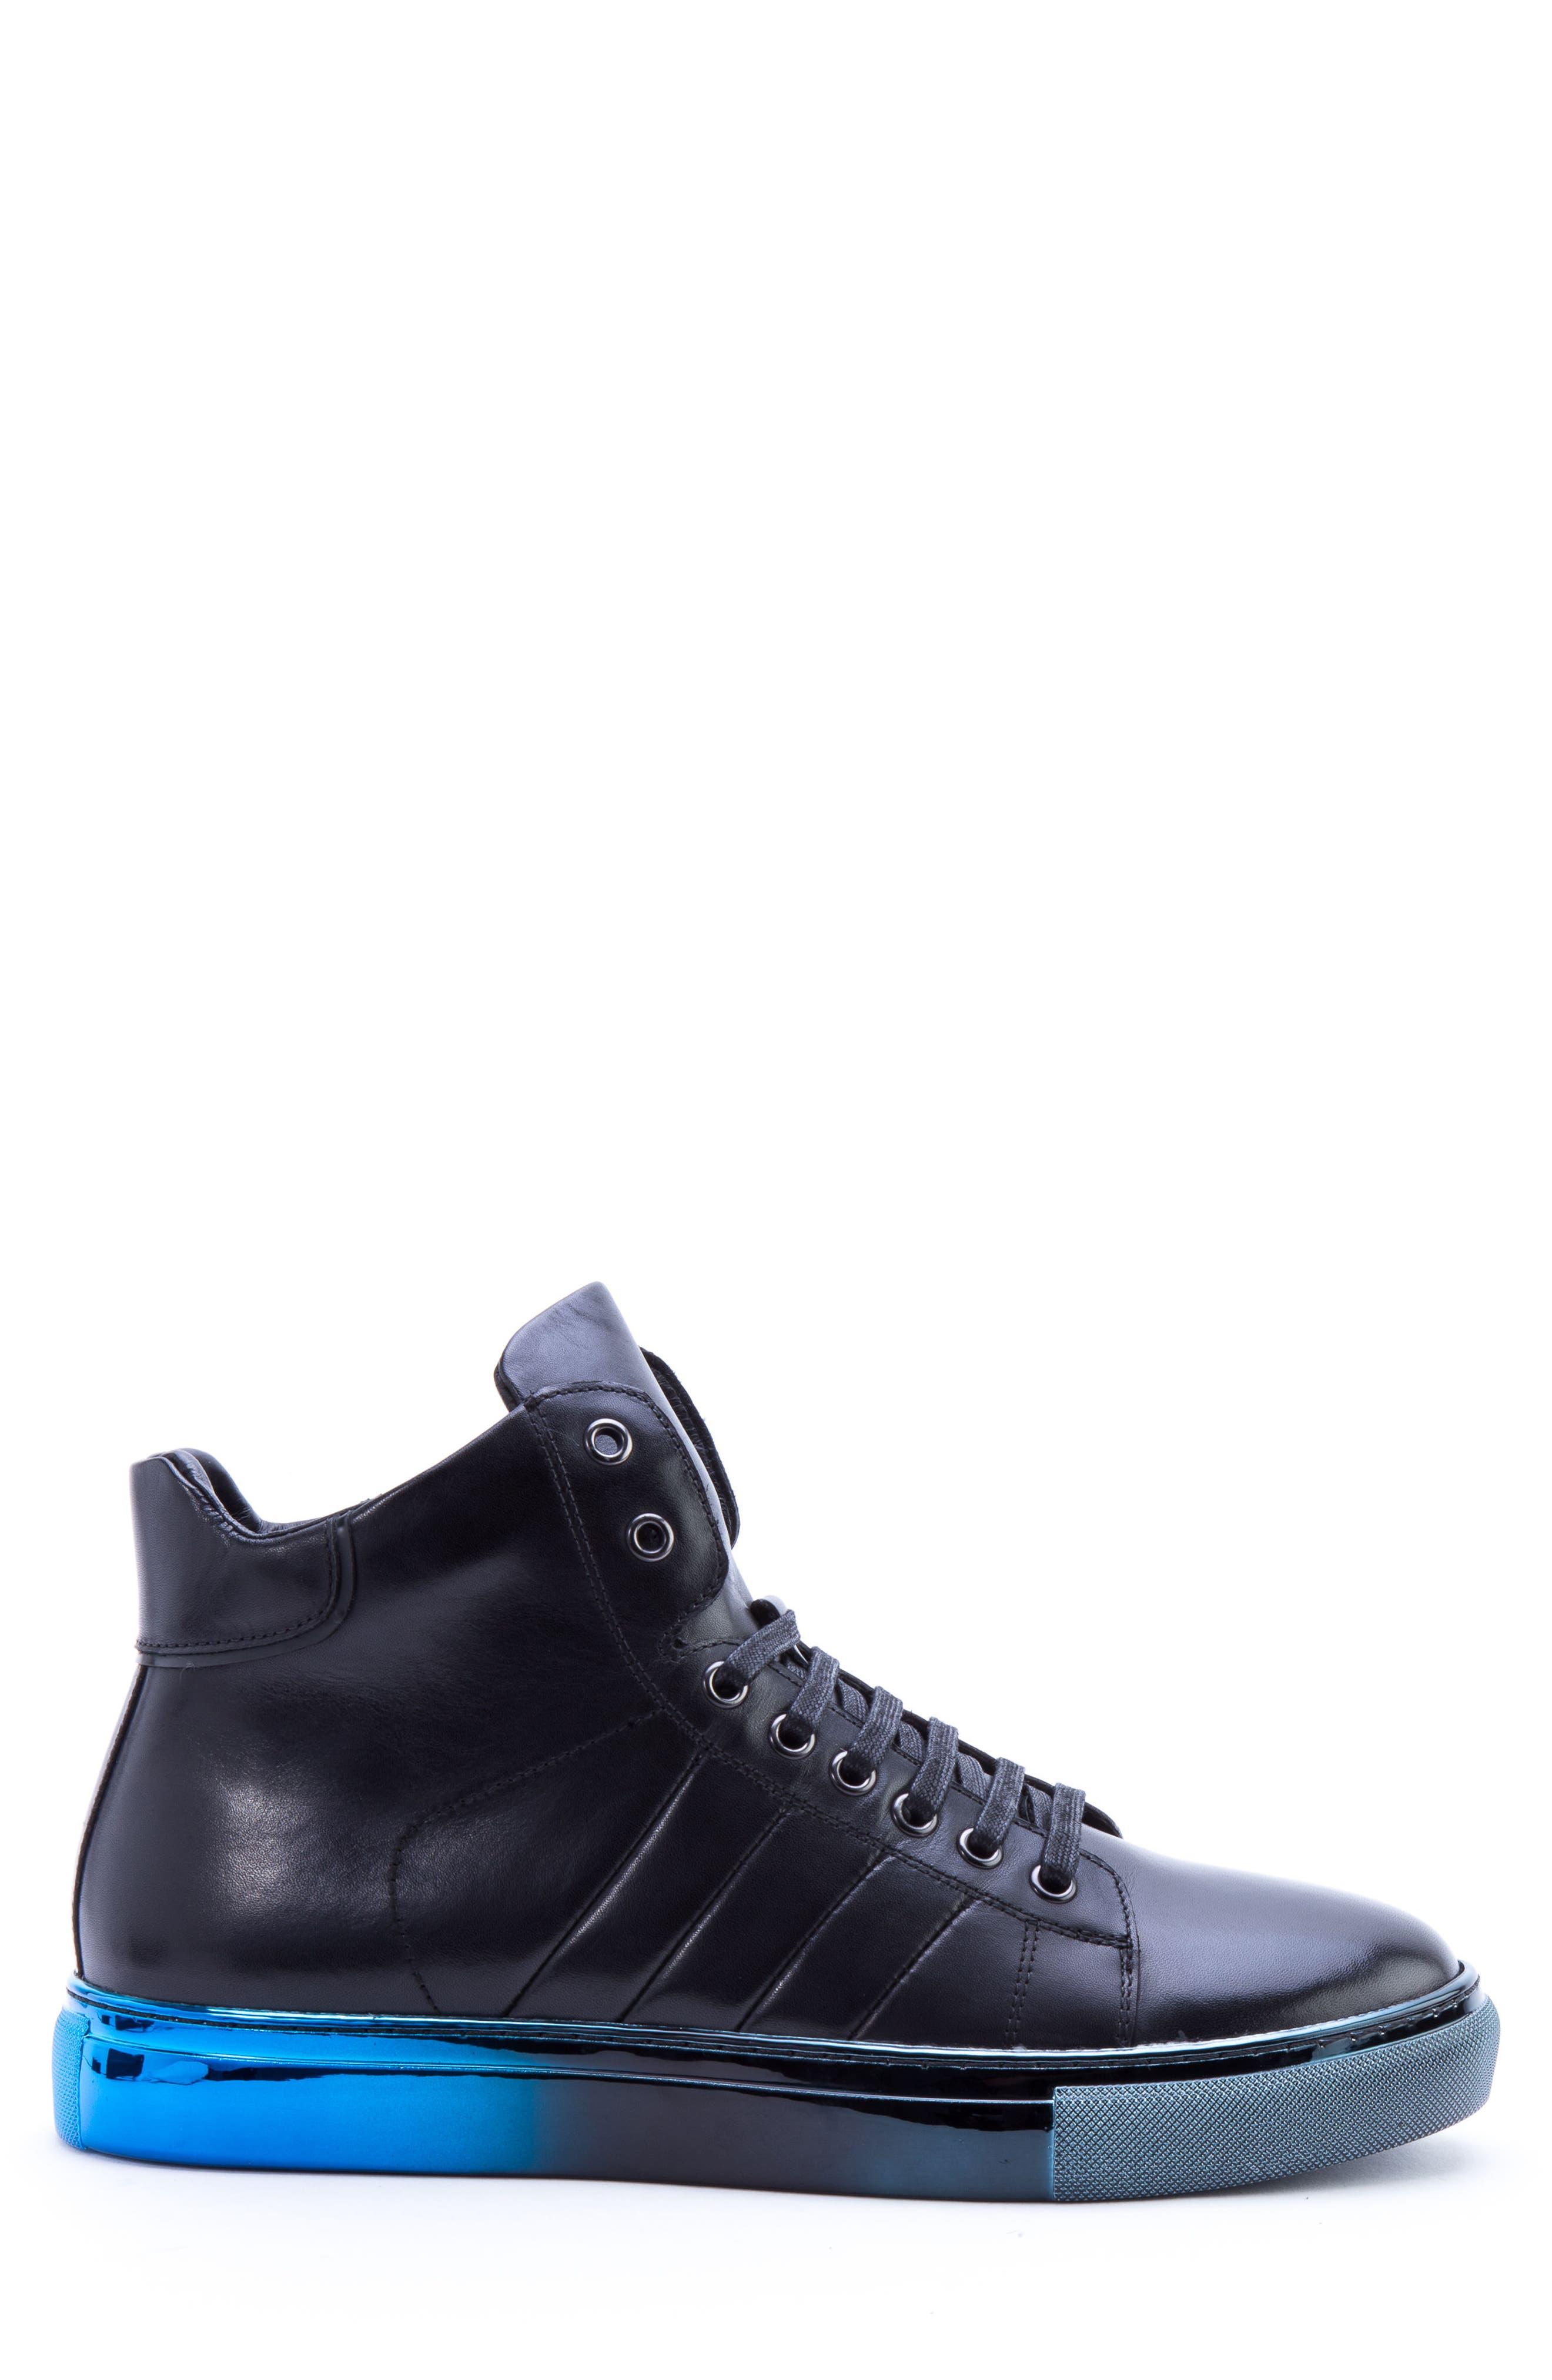 Badgley Mischka Hunter High Top Sneaker,                             Alternate thumbnail 3, color,                             NAVY LEATHER